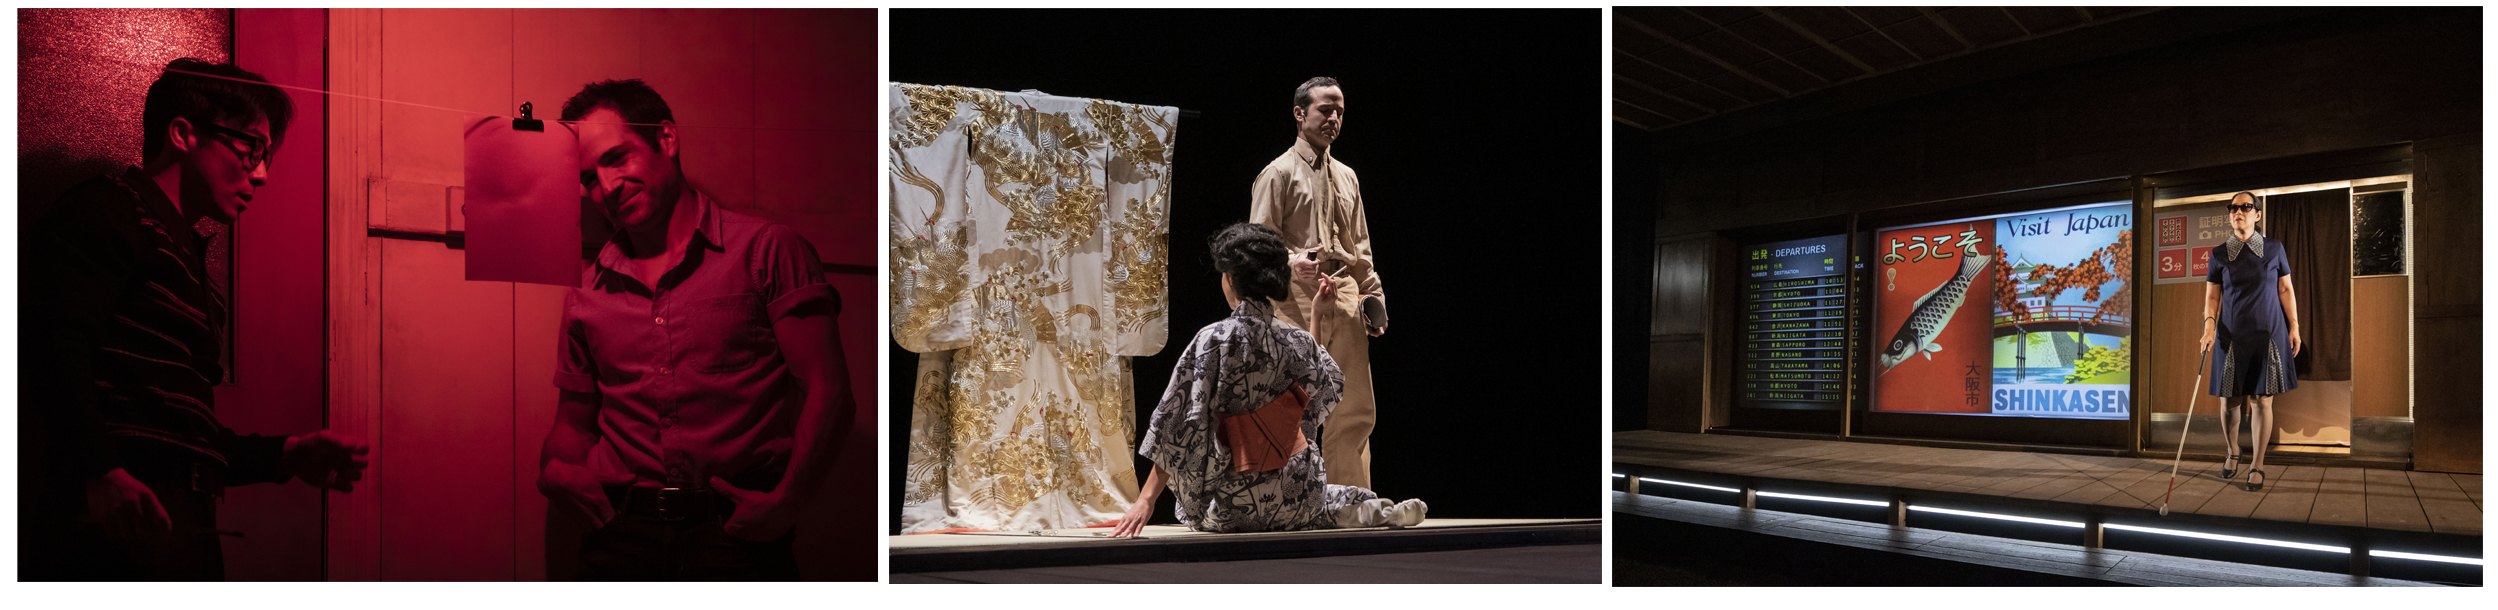 『HIROSHIMA 太田川七つの流れ』2019年9月ケベック公演より  (C)Elias Djemil Matassov